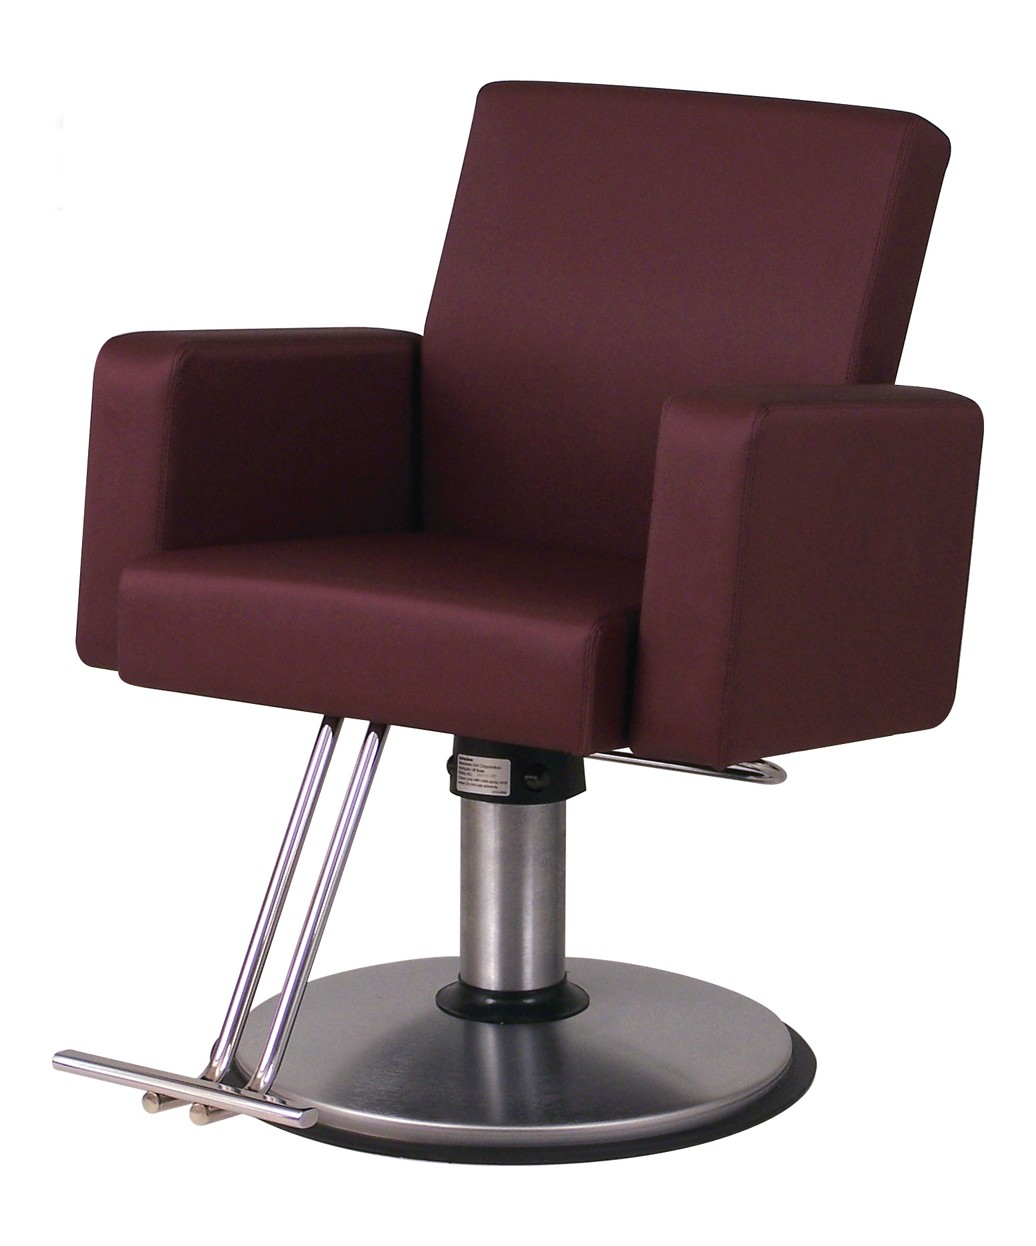 Belvedere PH11A Plush All Purpose Chair